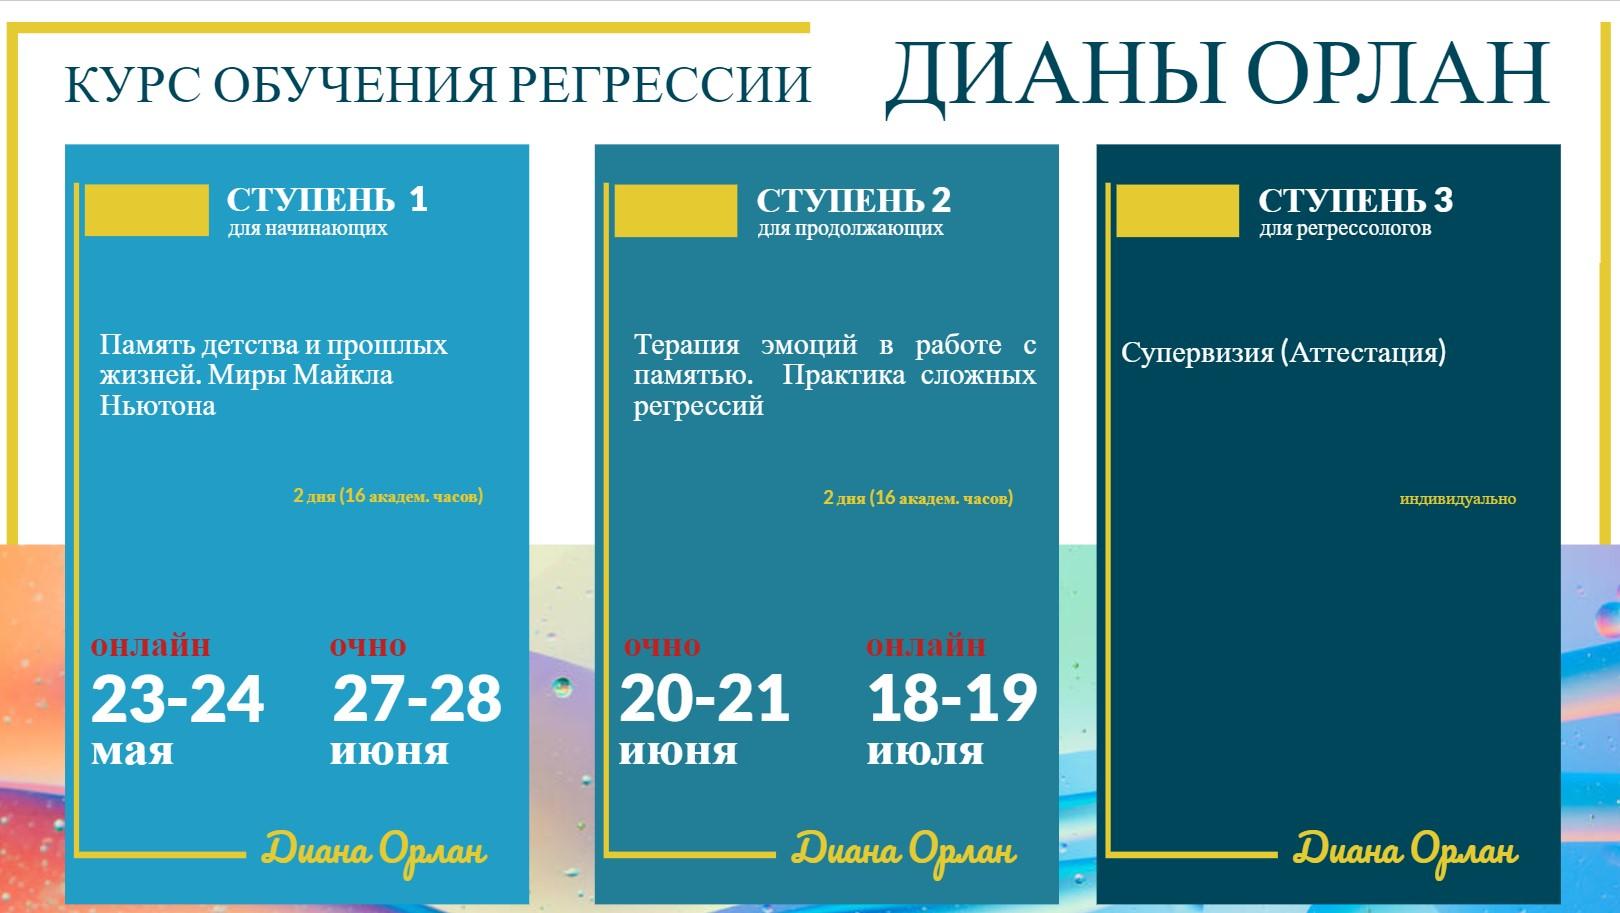 Онлайн курс Дианы ОРлан